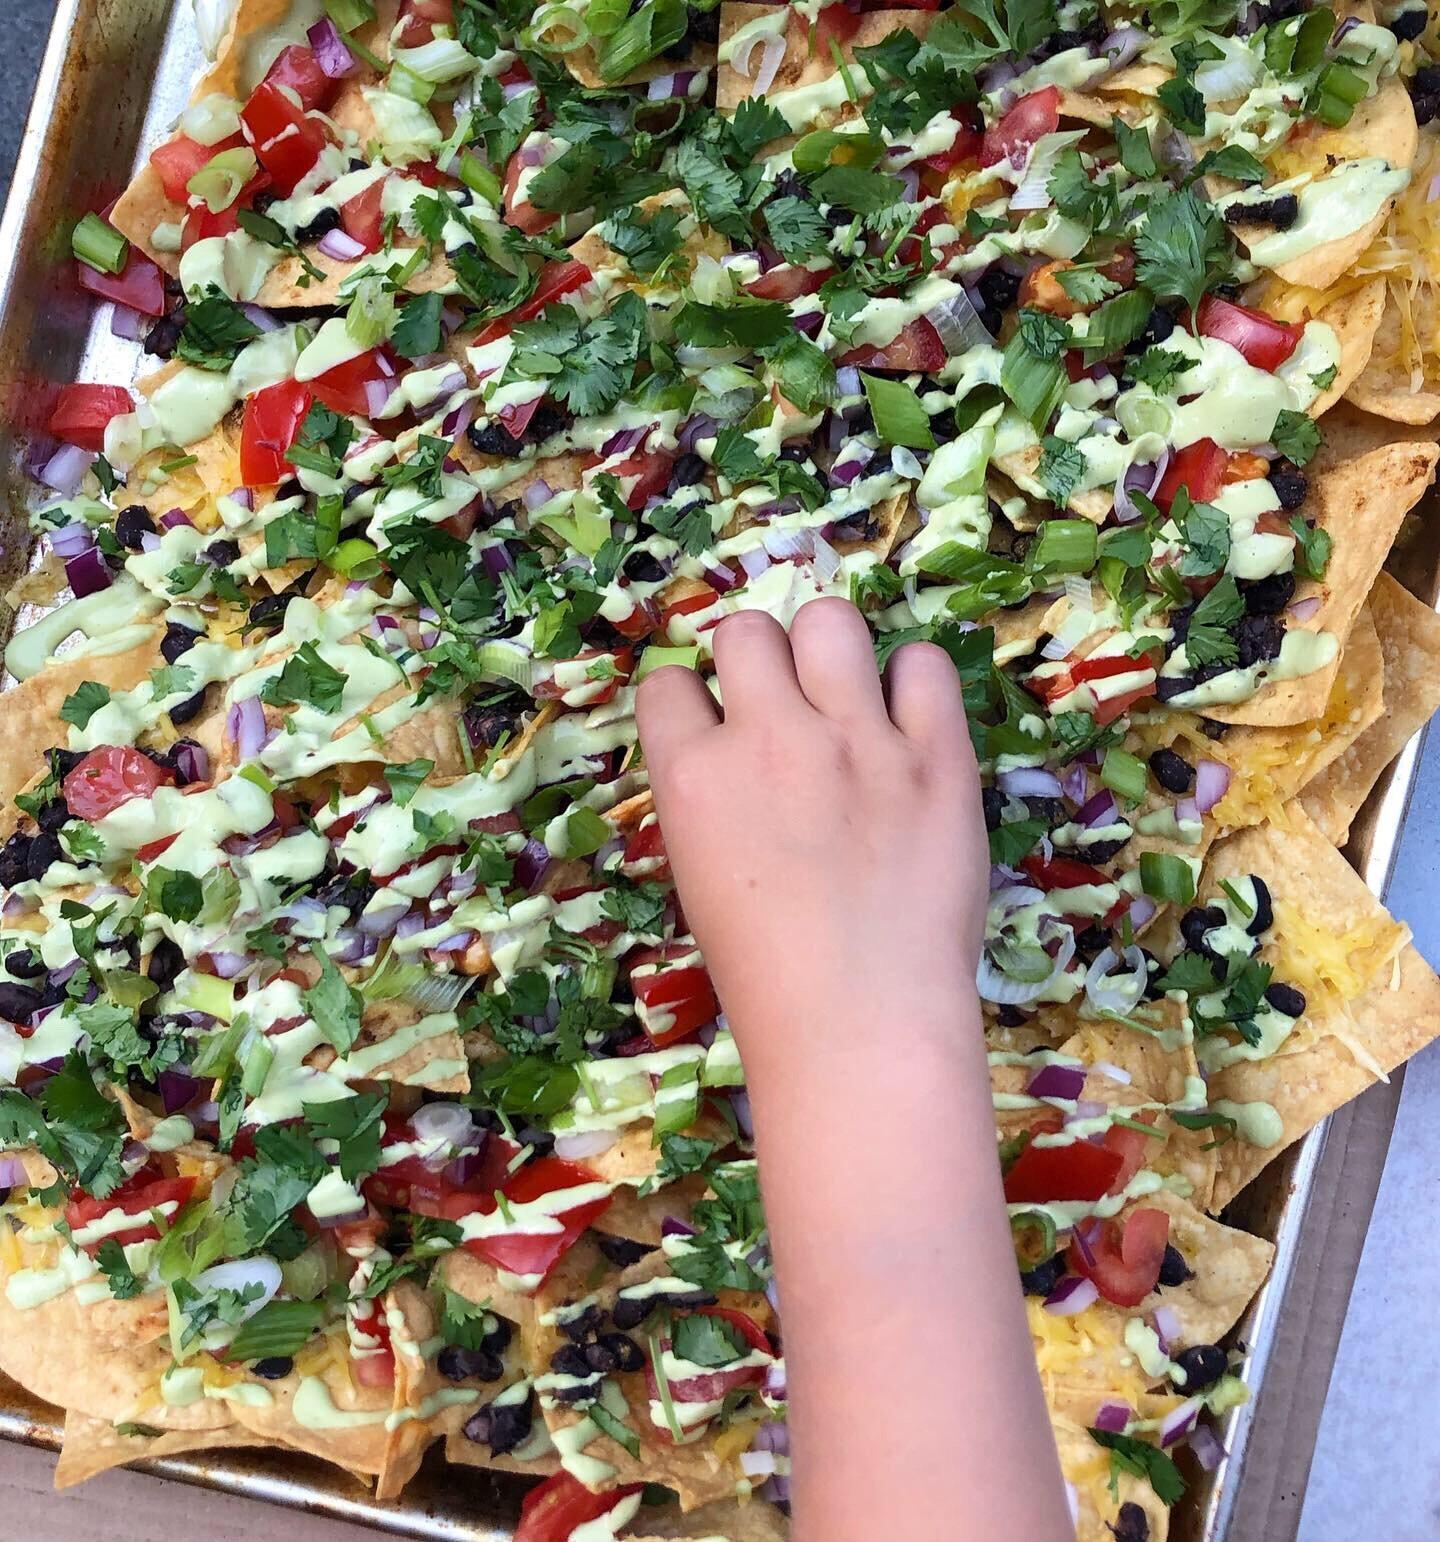 Cilantro-lime cream is great on nachos. Recipe  here .